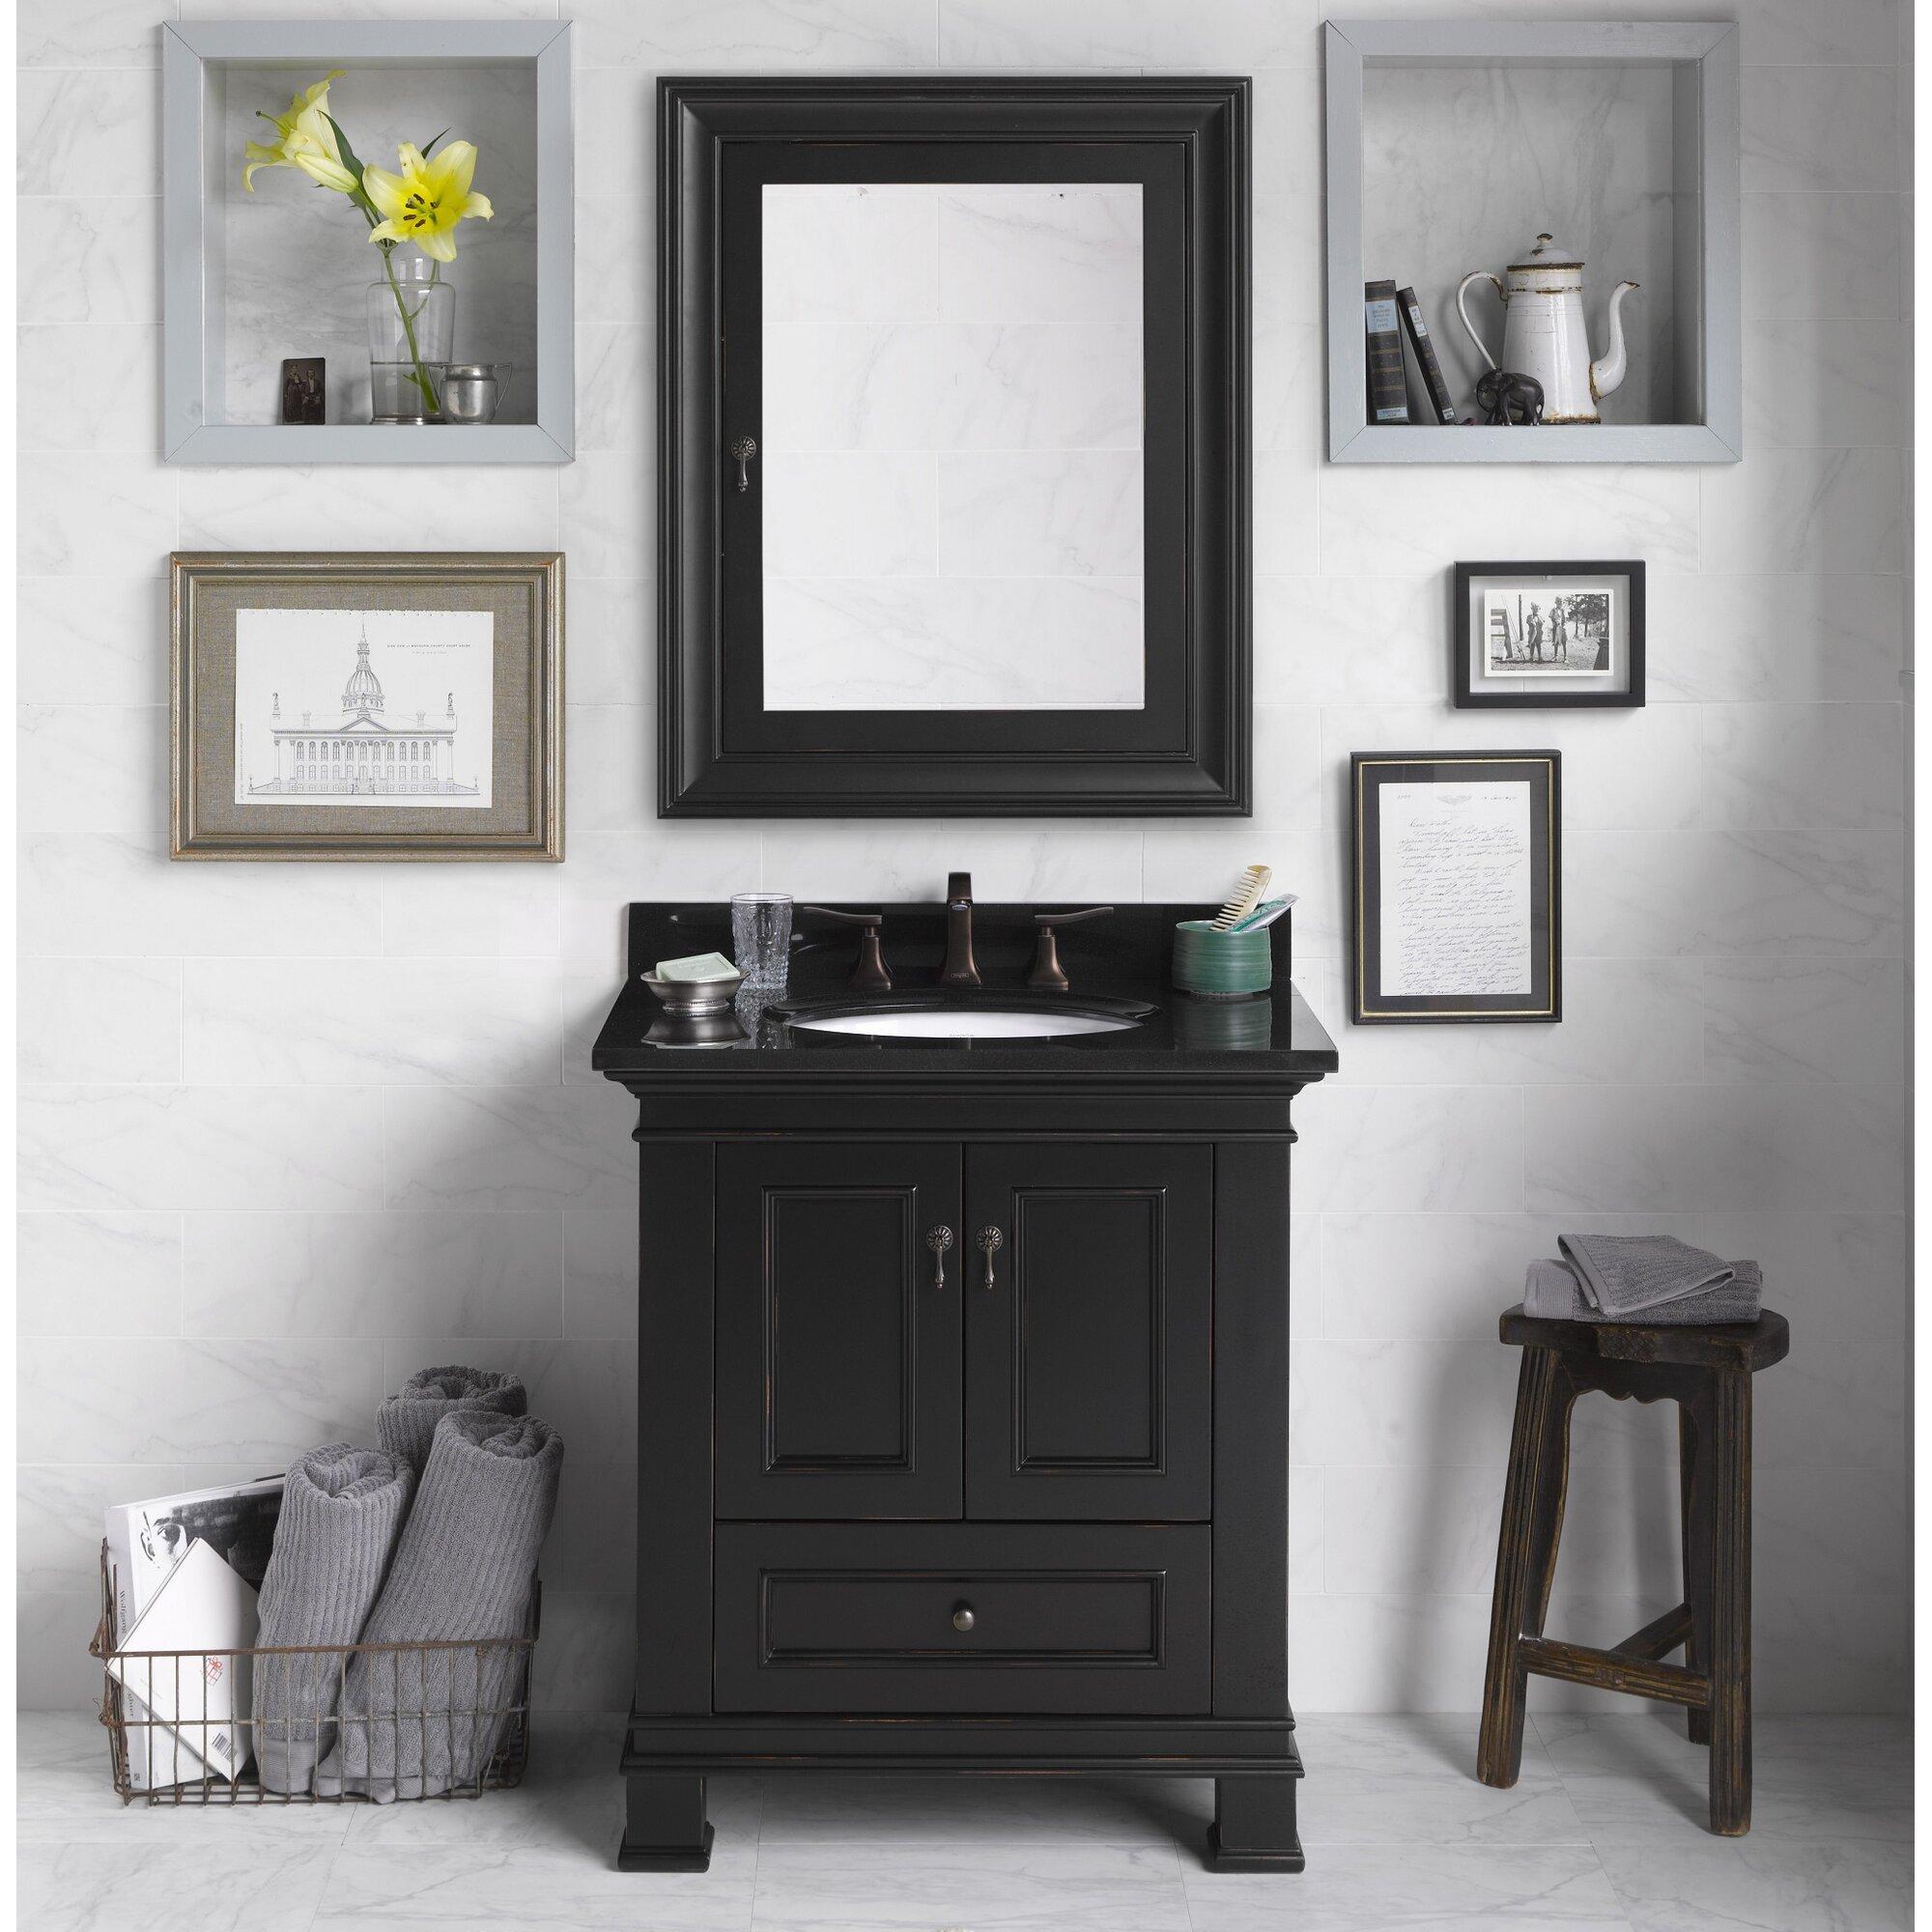 Ronbow venice 30 single bathroom vanity set with mirror for Bathroom mirror set